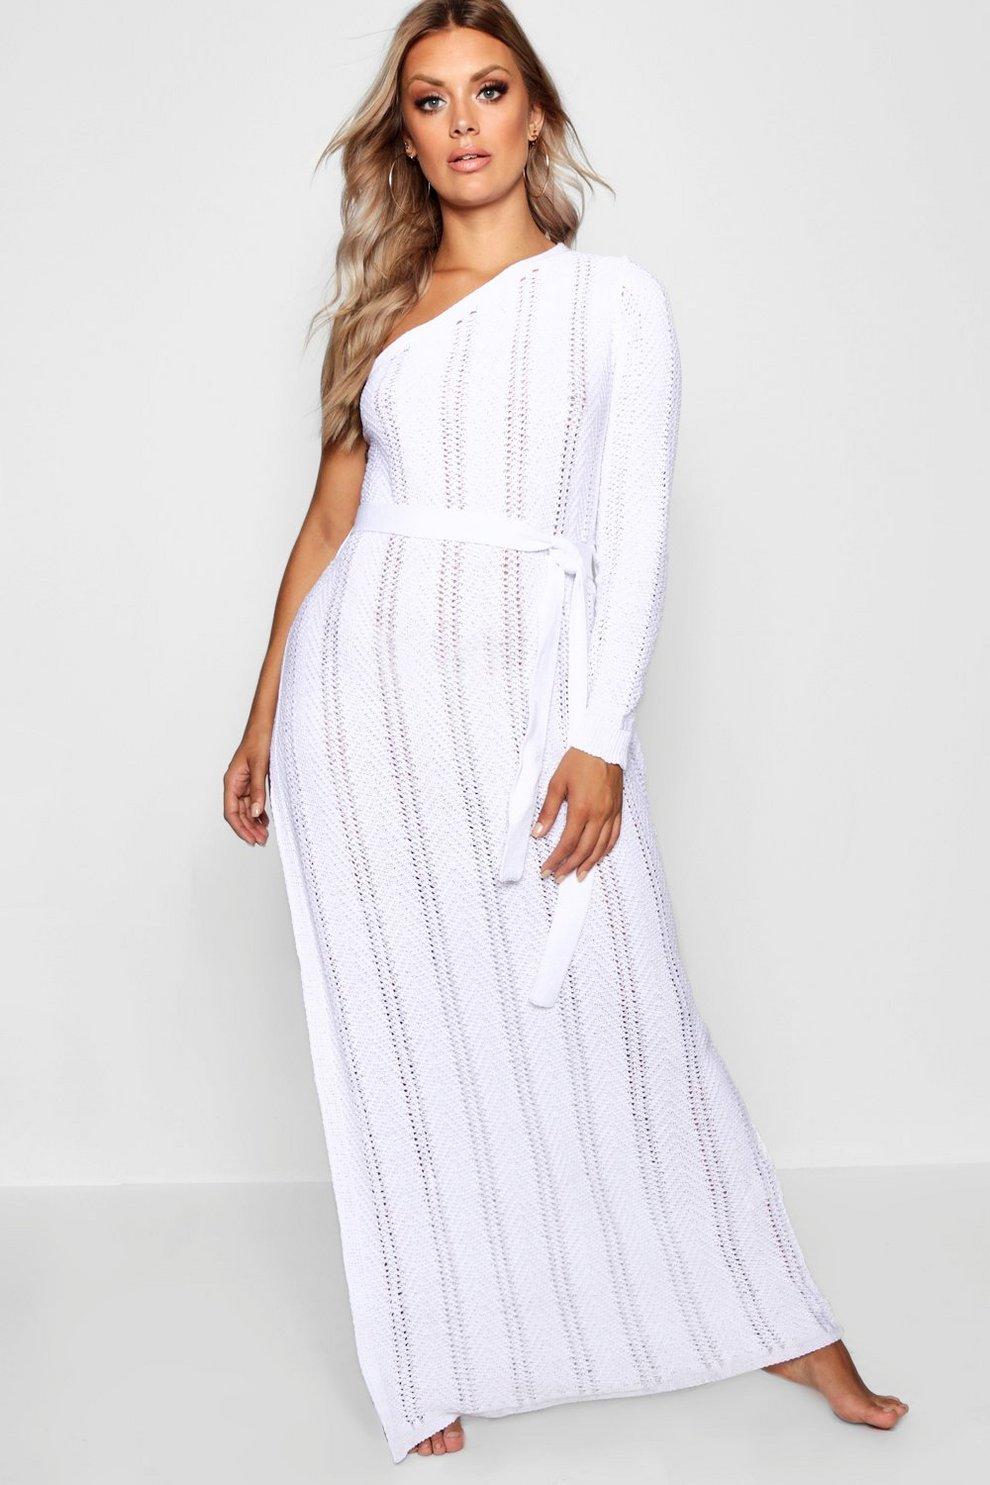 2fada3eb10bd Womens White Plus One Shoulder Crochet Beach Dress. Hover to zoom